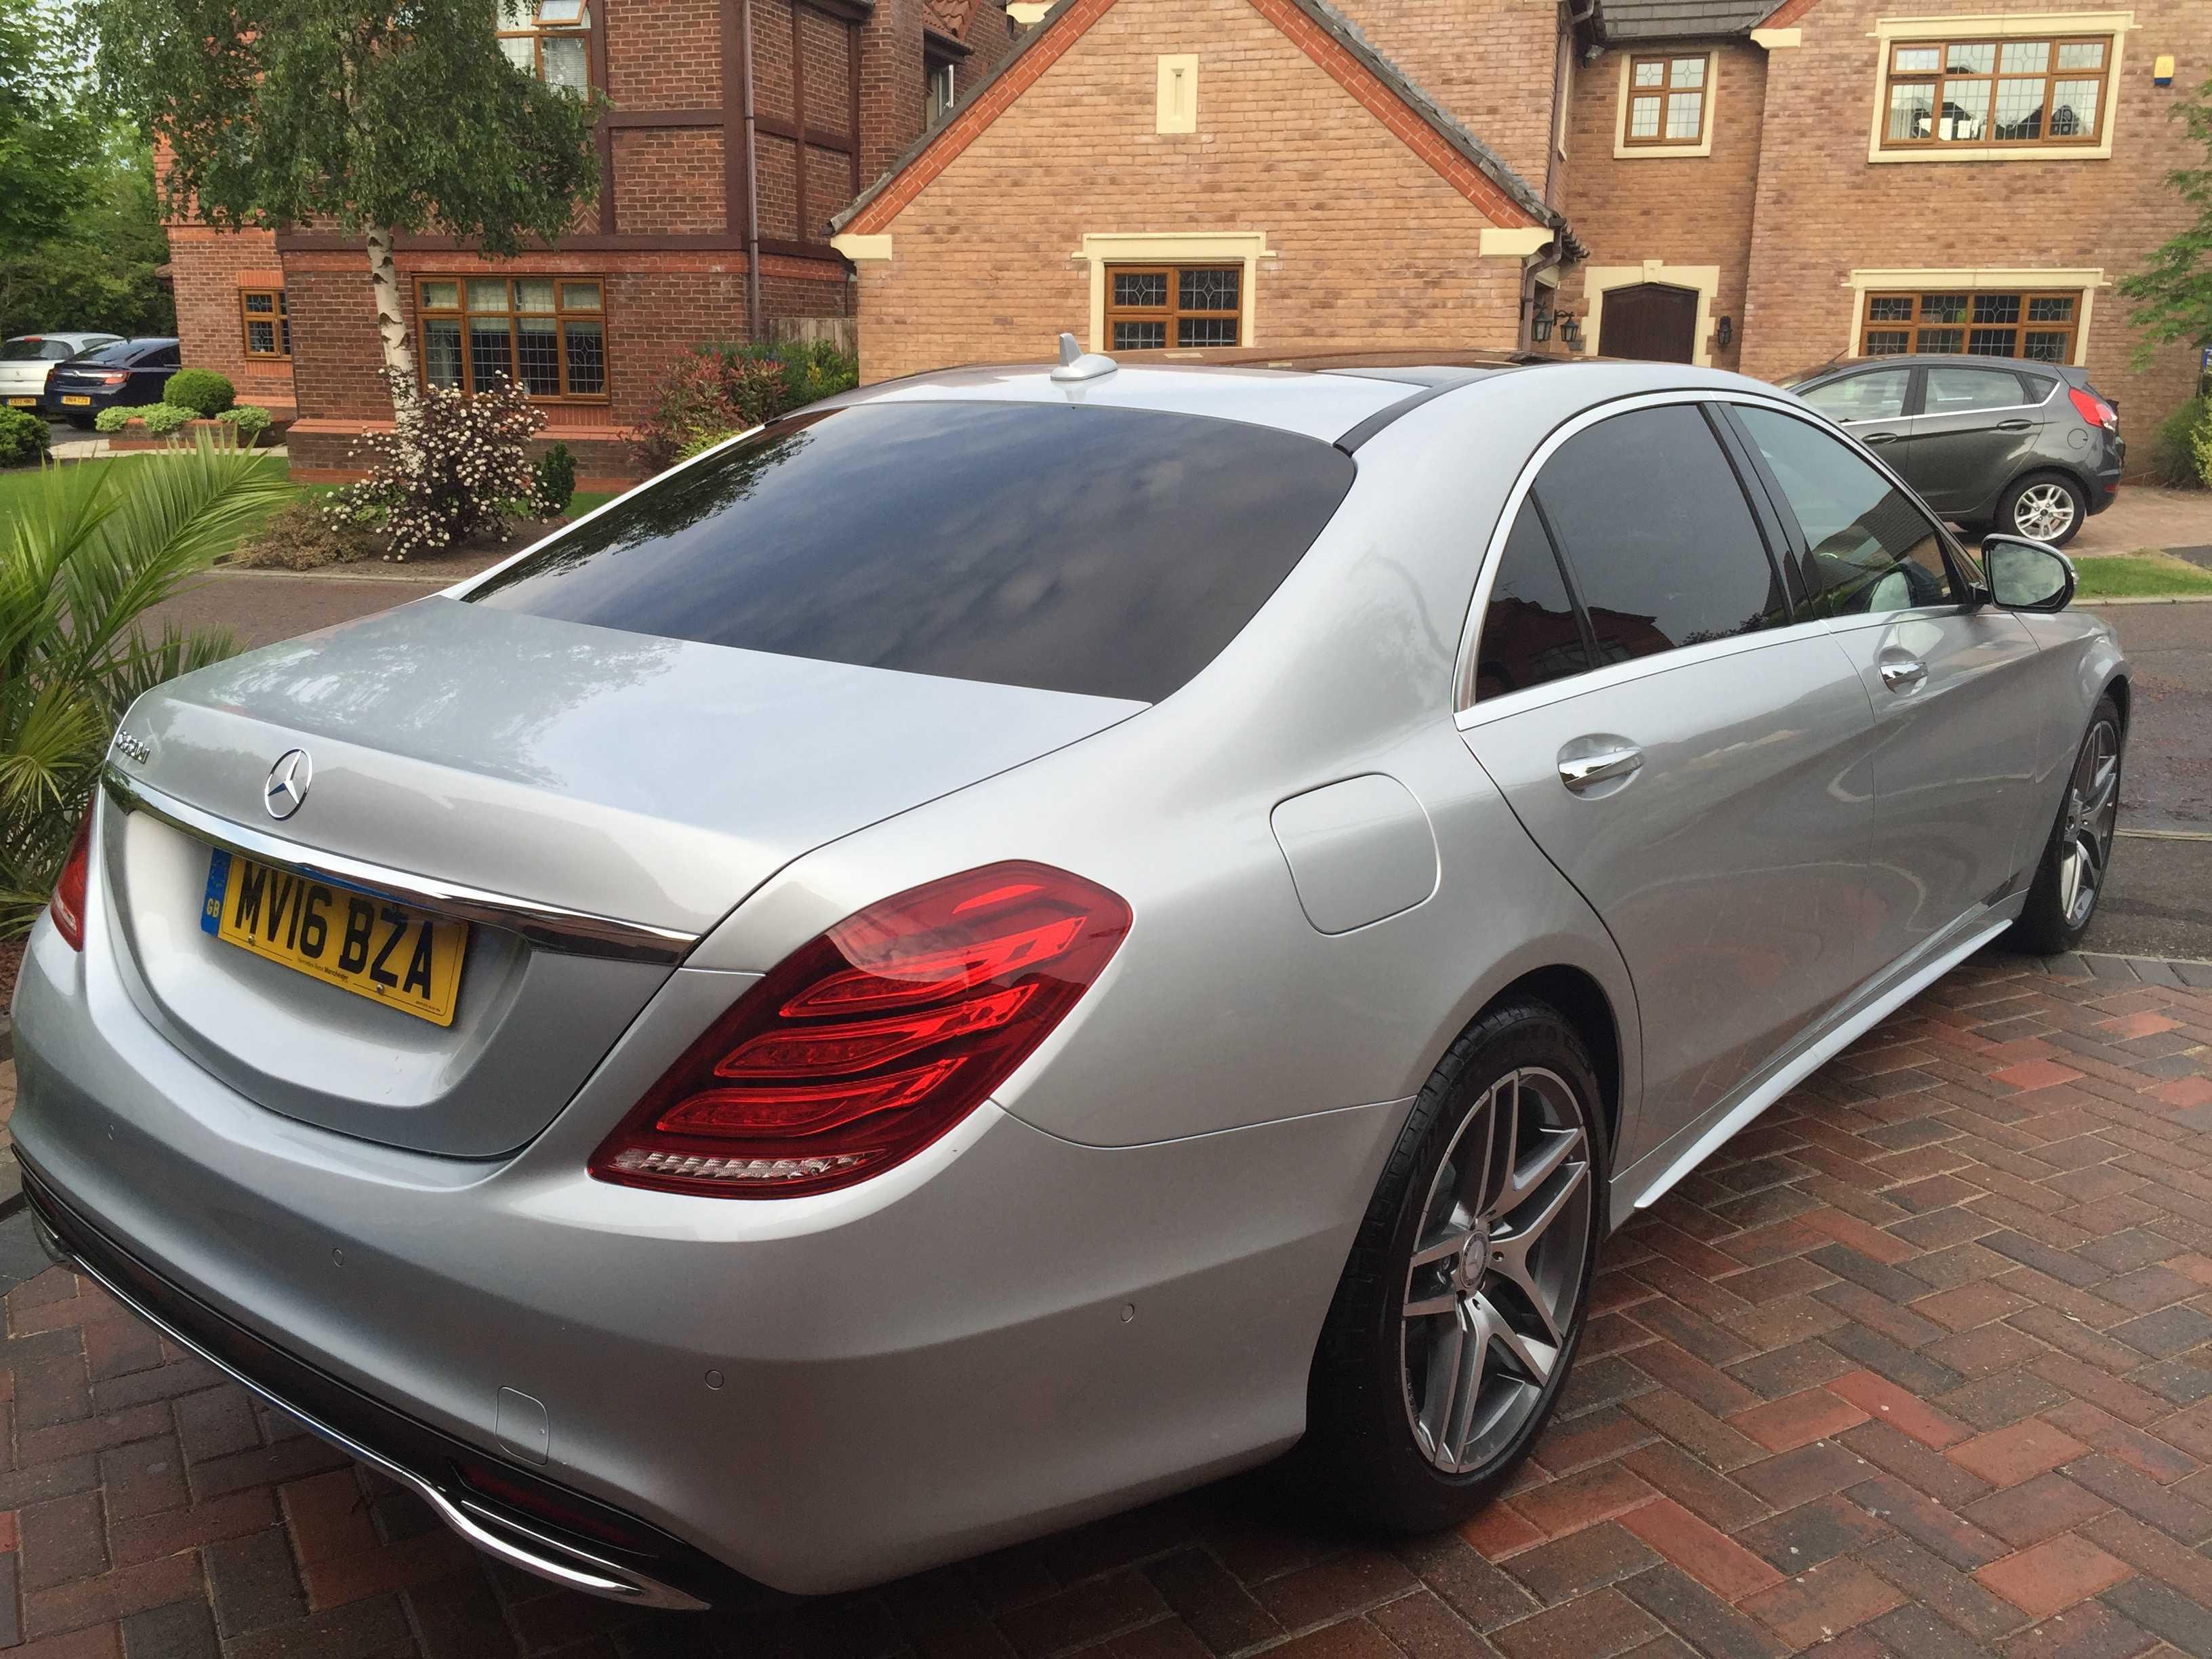 Luxury wedding car hire in Widnes